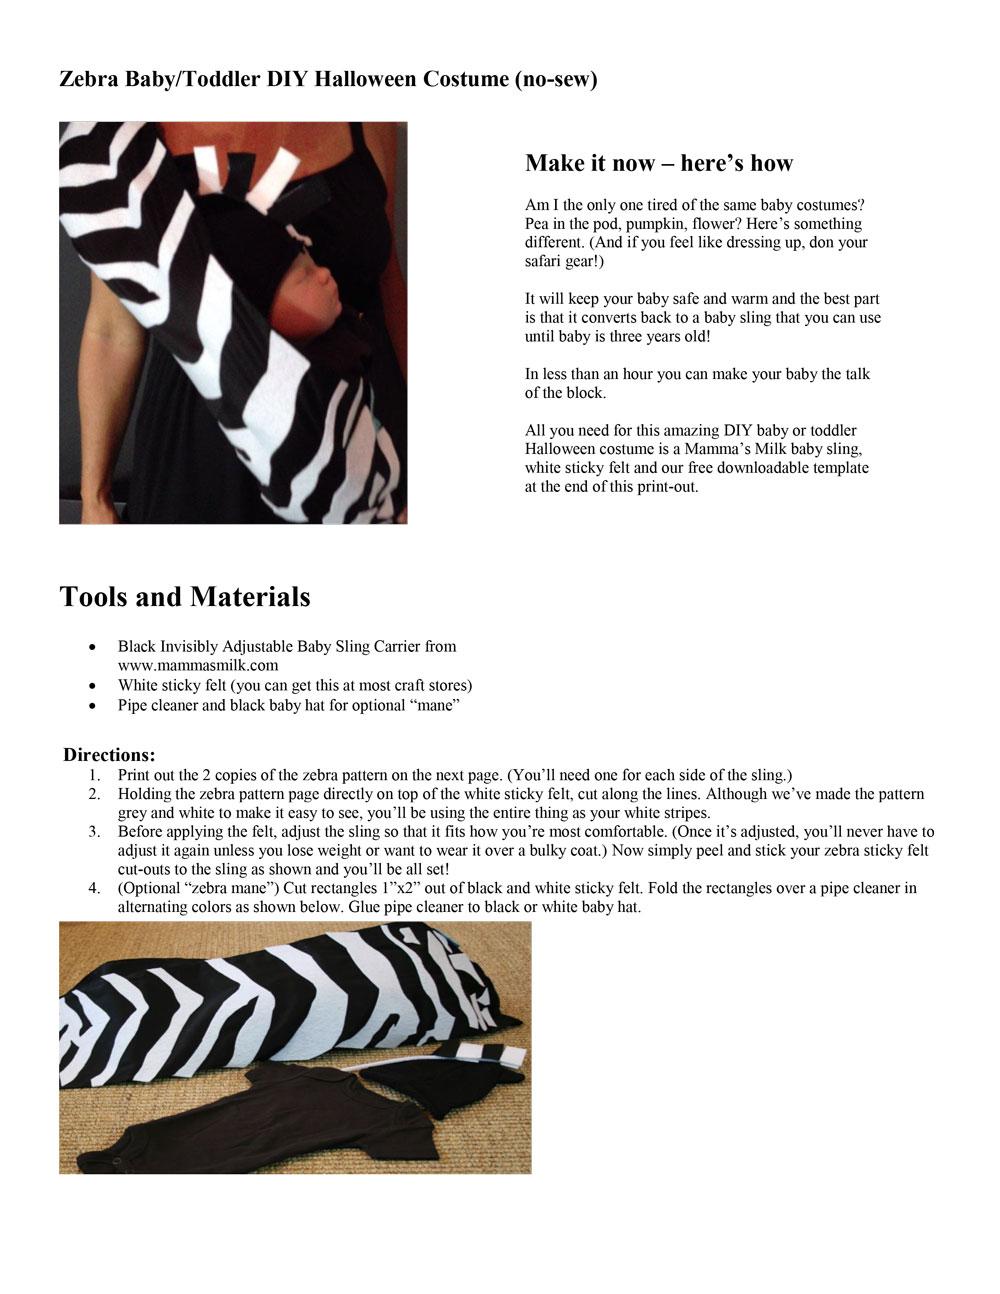 Zebra Baby Sling DIY Pattern